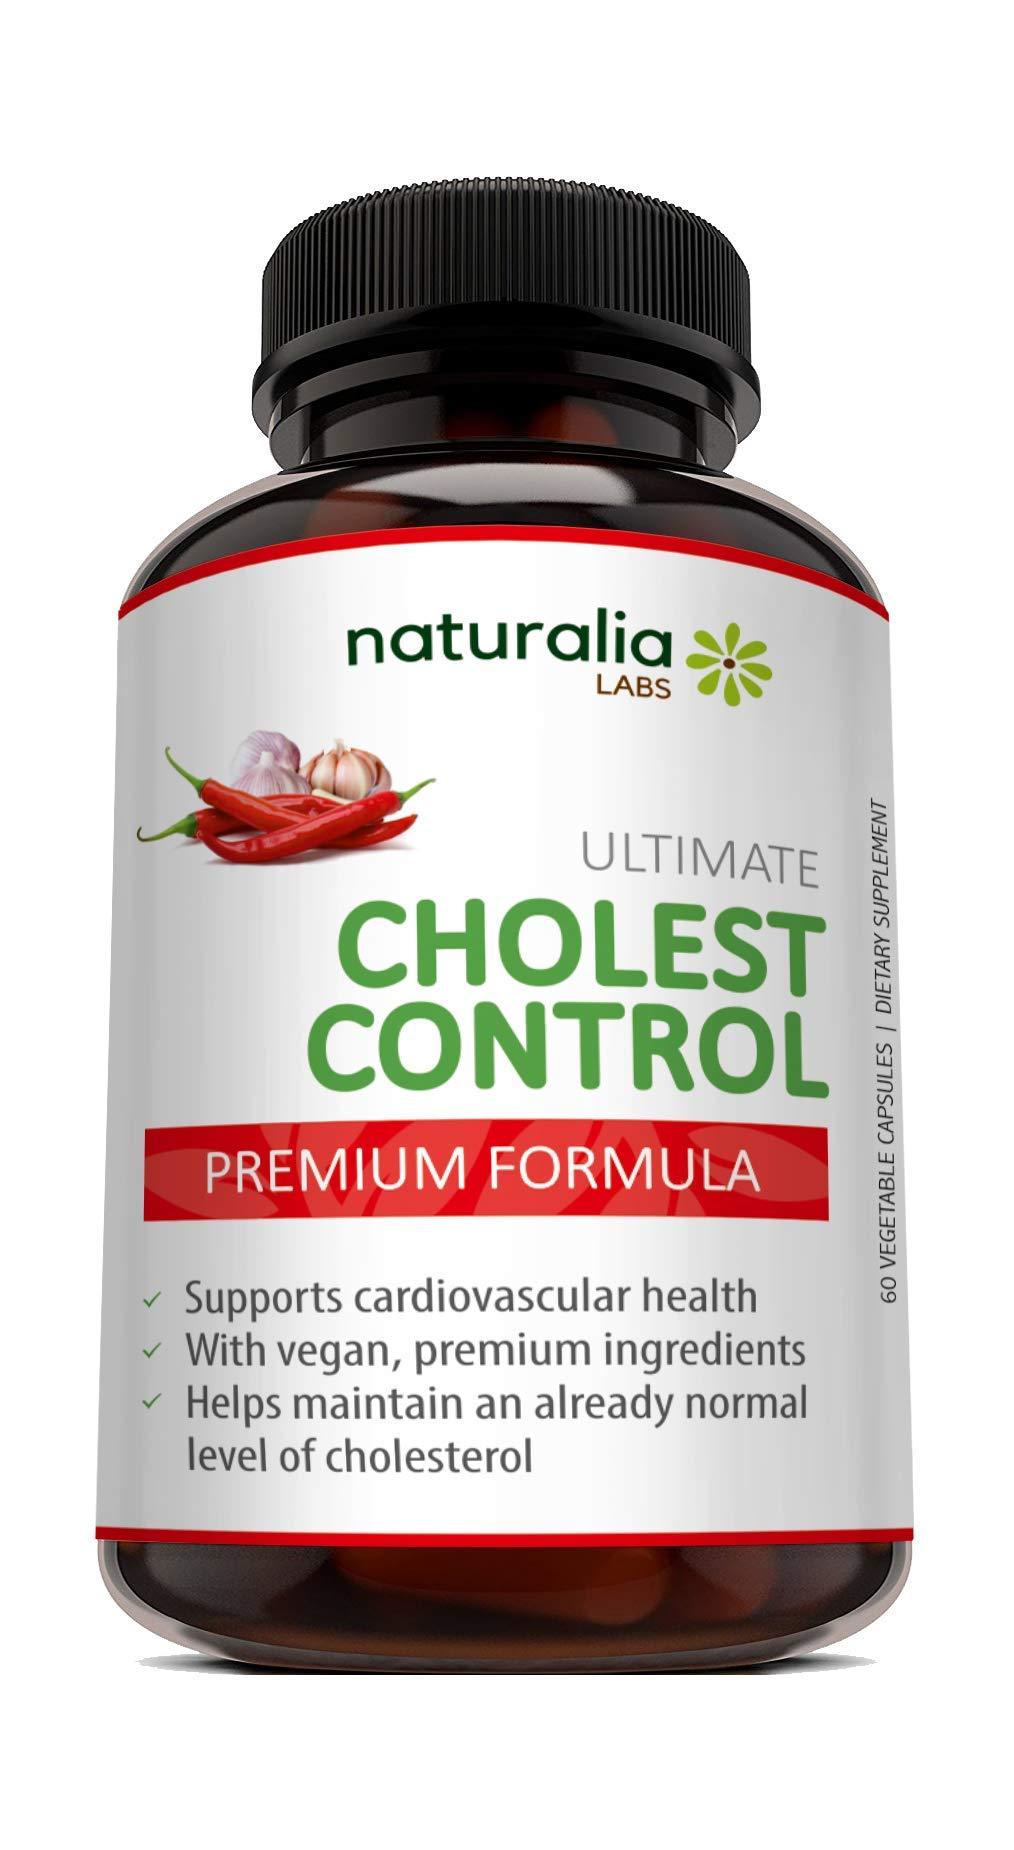 Naturalia Labs - Cholesterol Lowering Supplements - Garlic Pills for Heart Health - 100% Natural Ingredients - Garlic, Guggul, Niacin, Policosanol, Beta Sitosterol - 60 Veggie Capsules